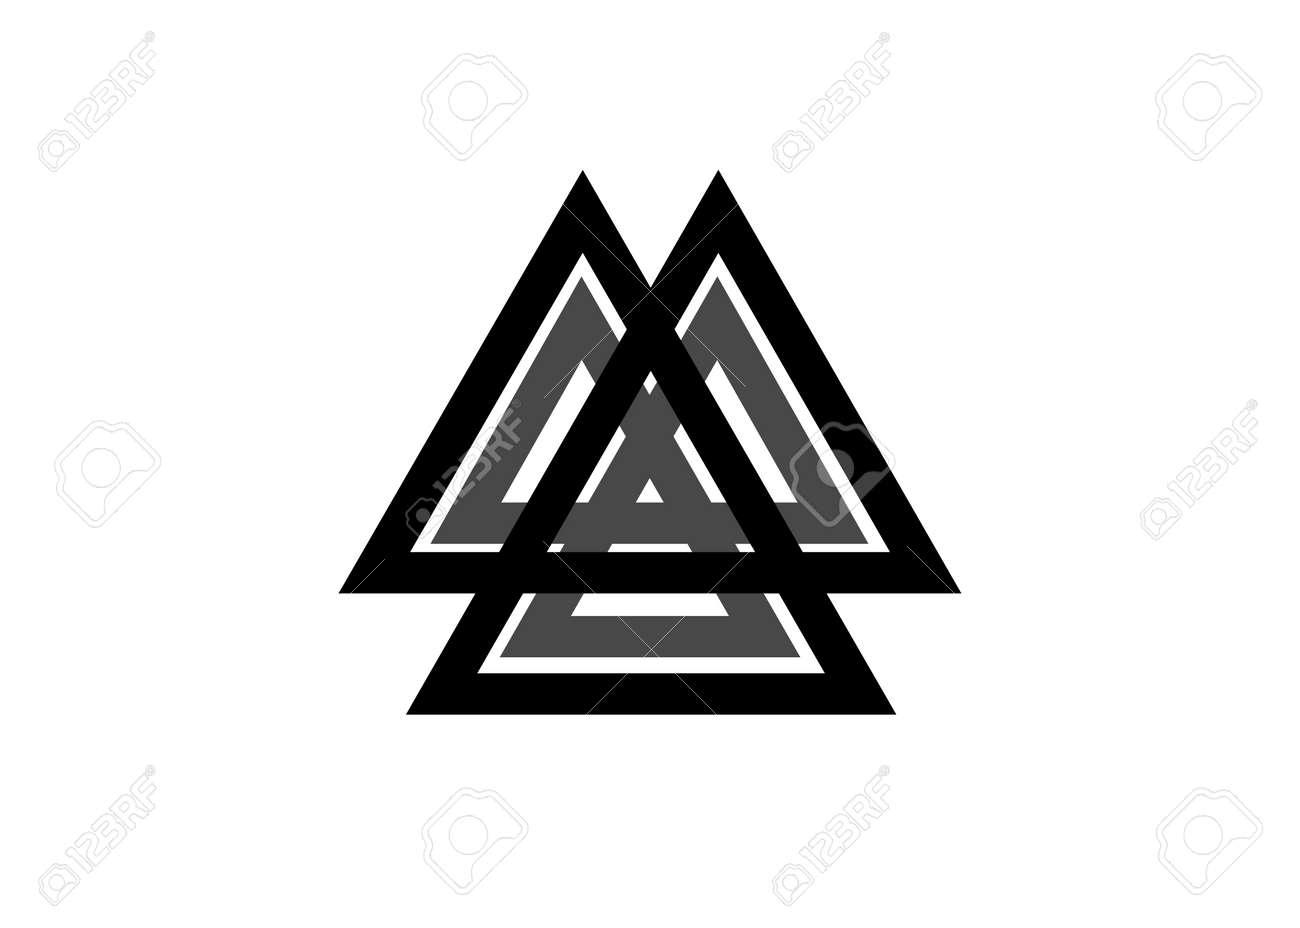 Interwoven triangles, valknut, sacred geometry. Flat icon. - 173556678